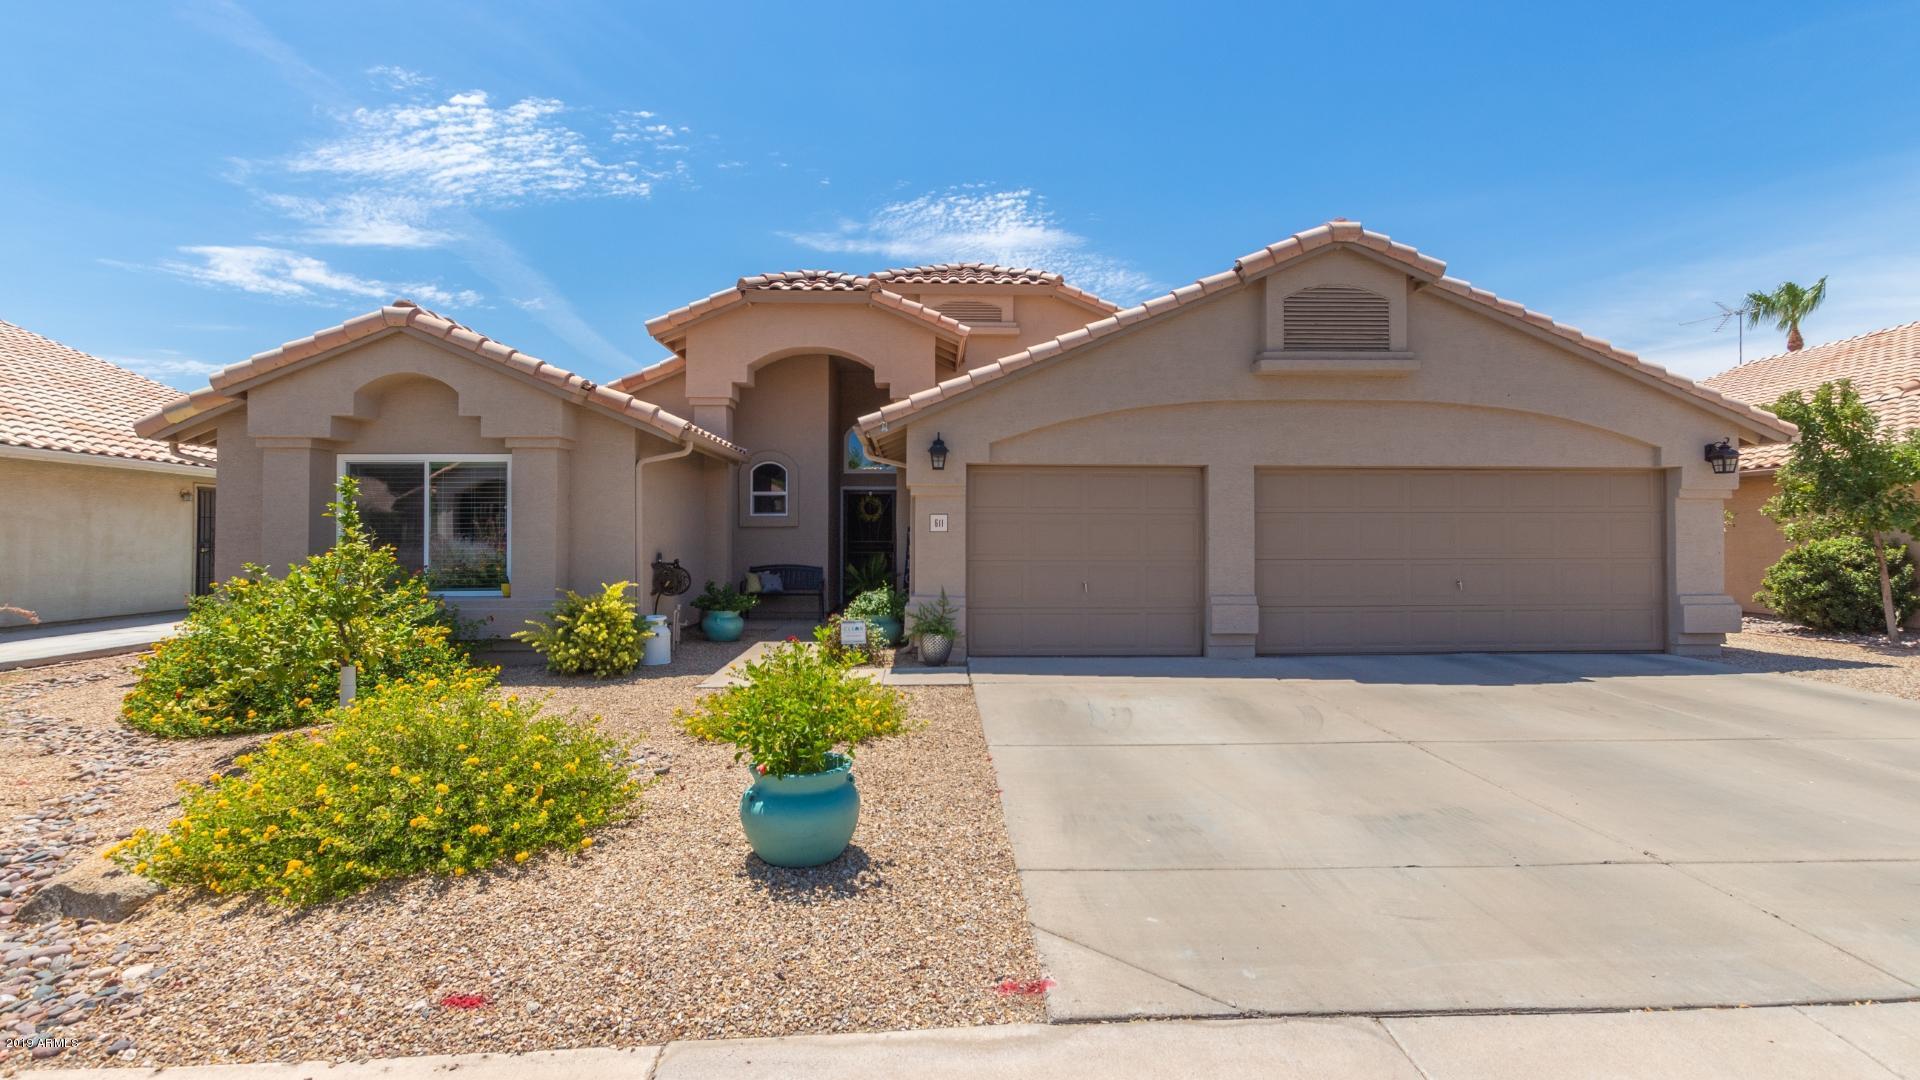 Photo of 611 W NAVARRO Avenue, Mesa, AZ 85210